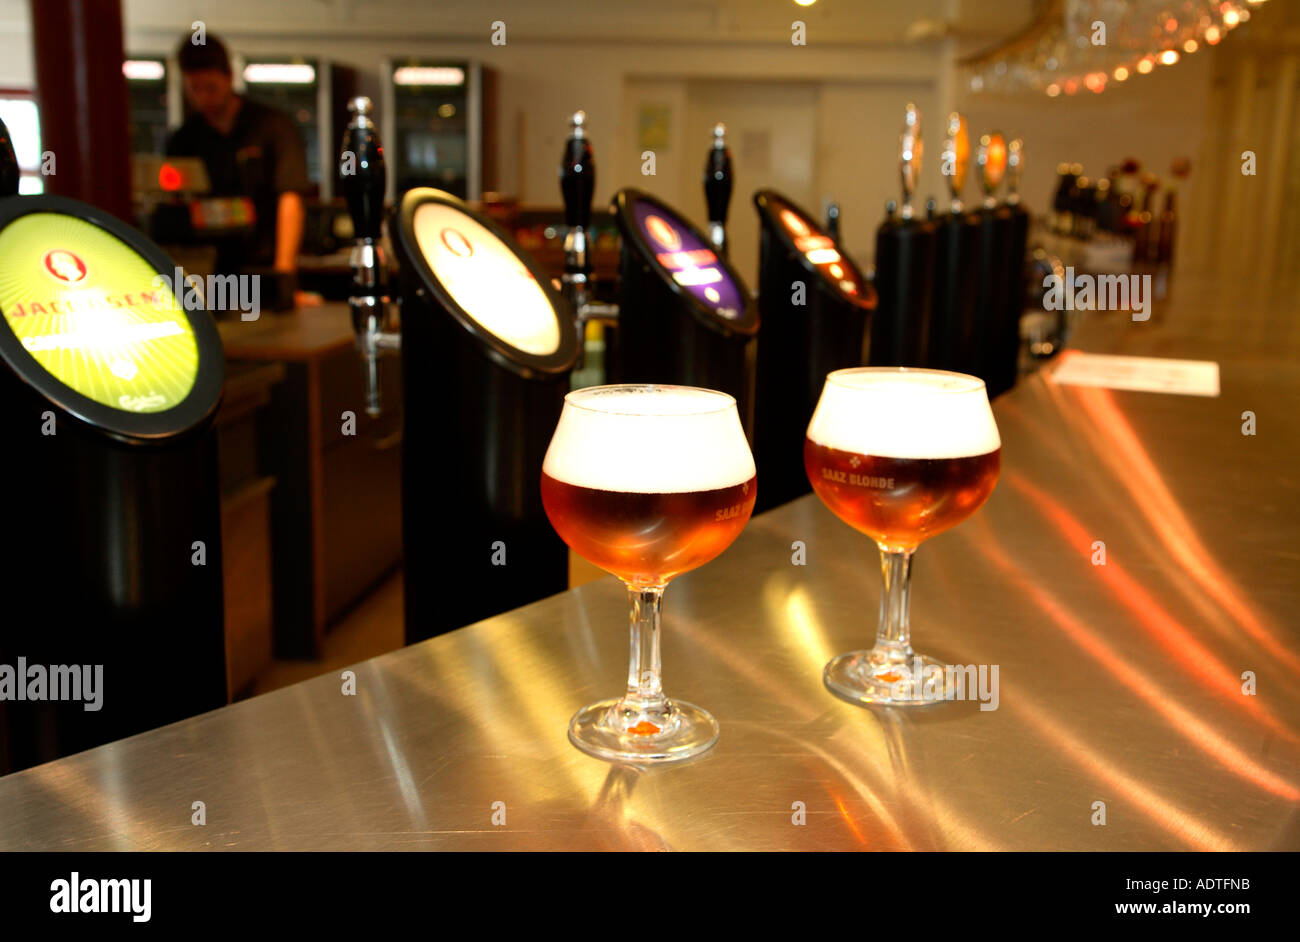 Denmark Copenhagen Carlsberg brewery beer bar - Stock Image